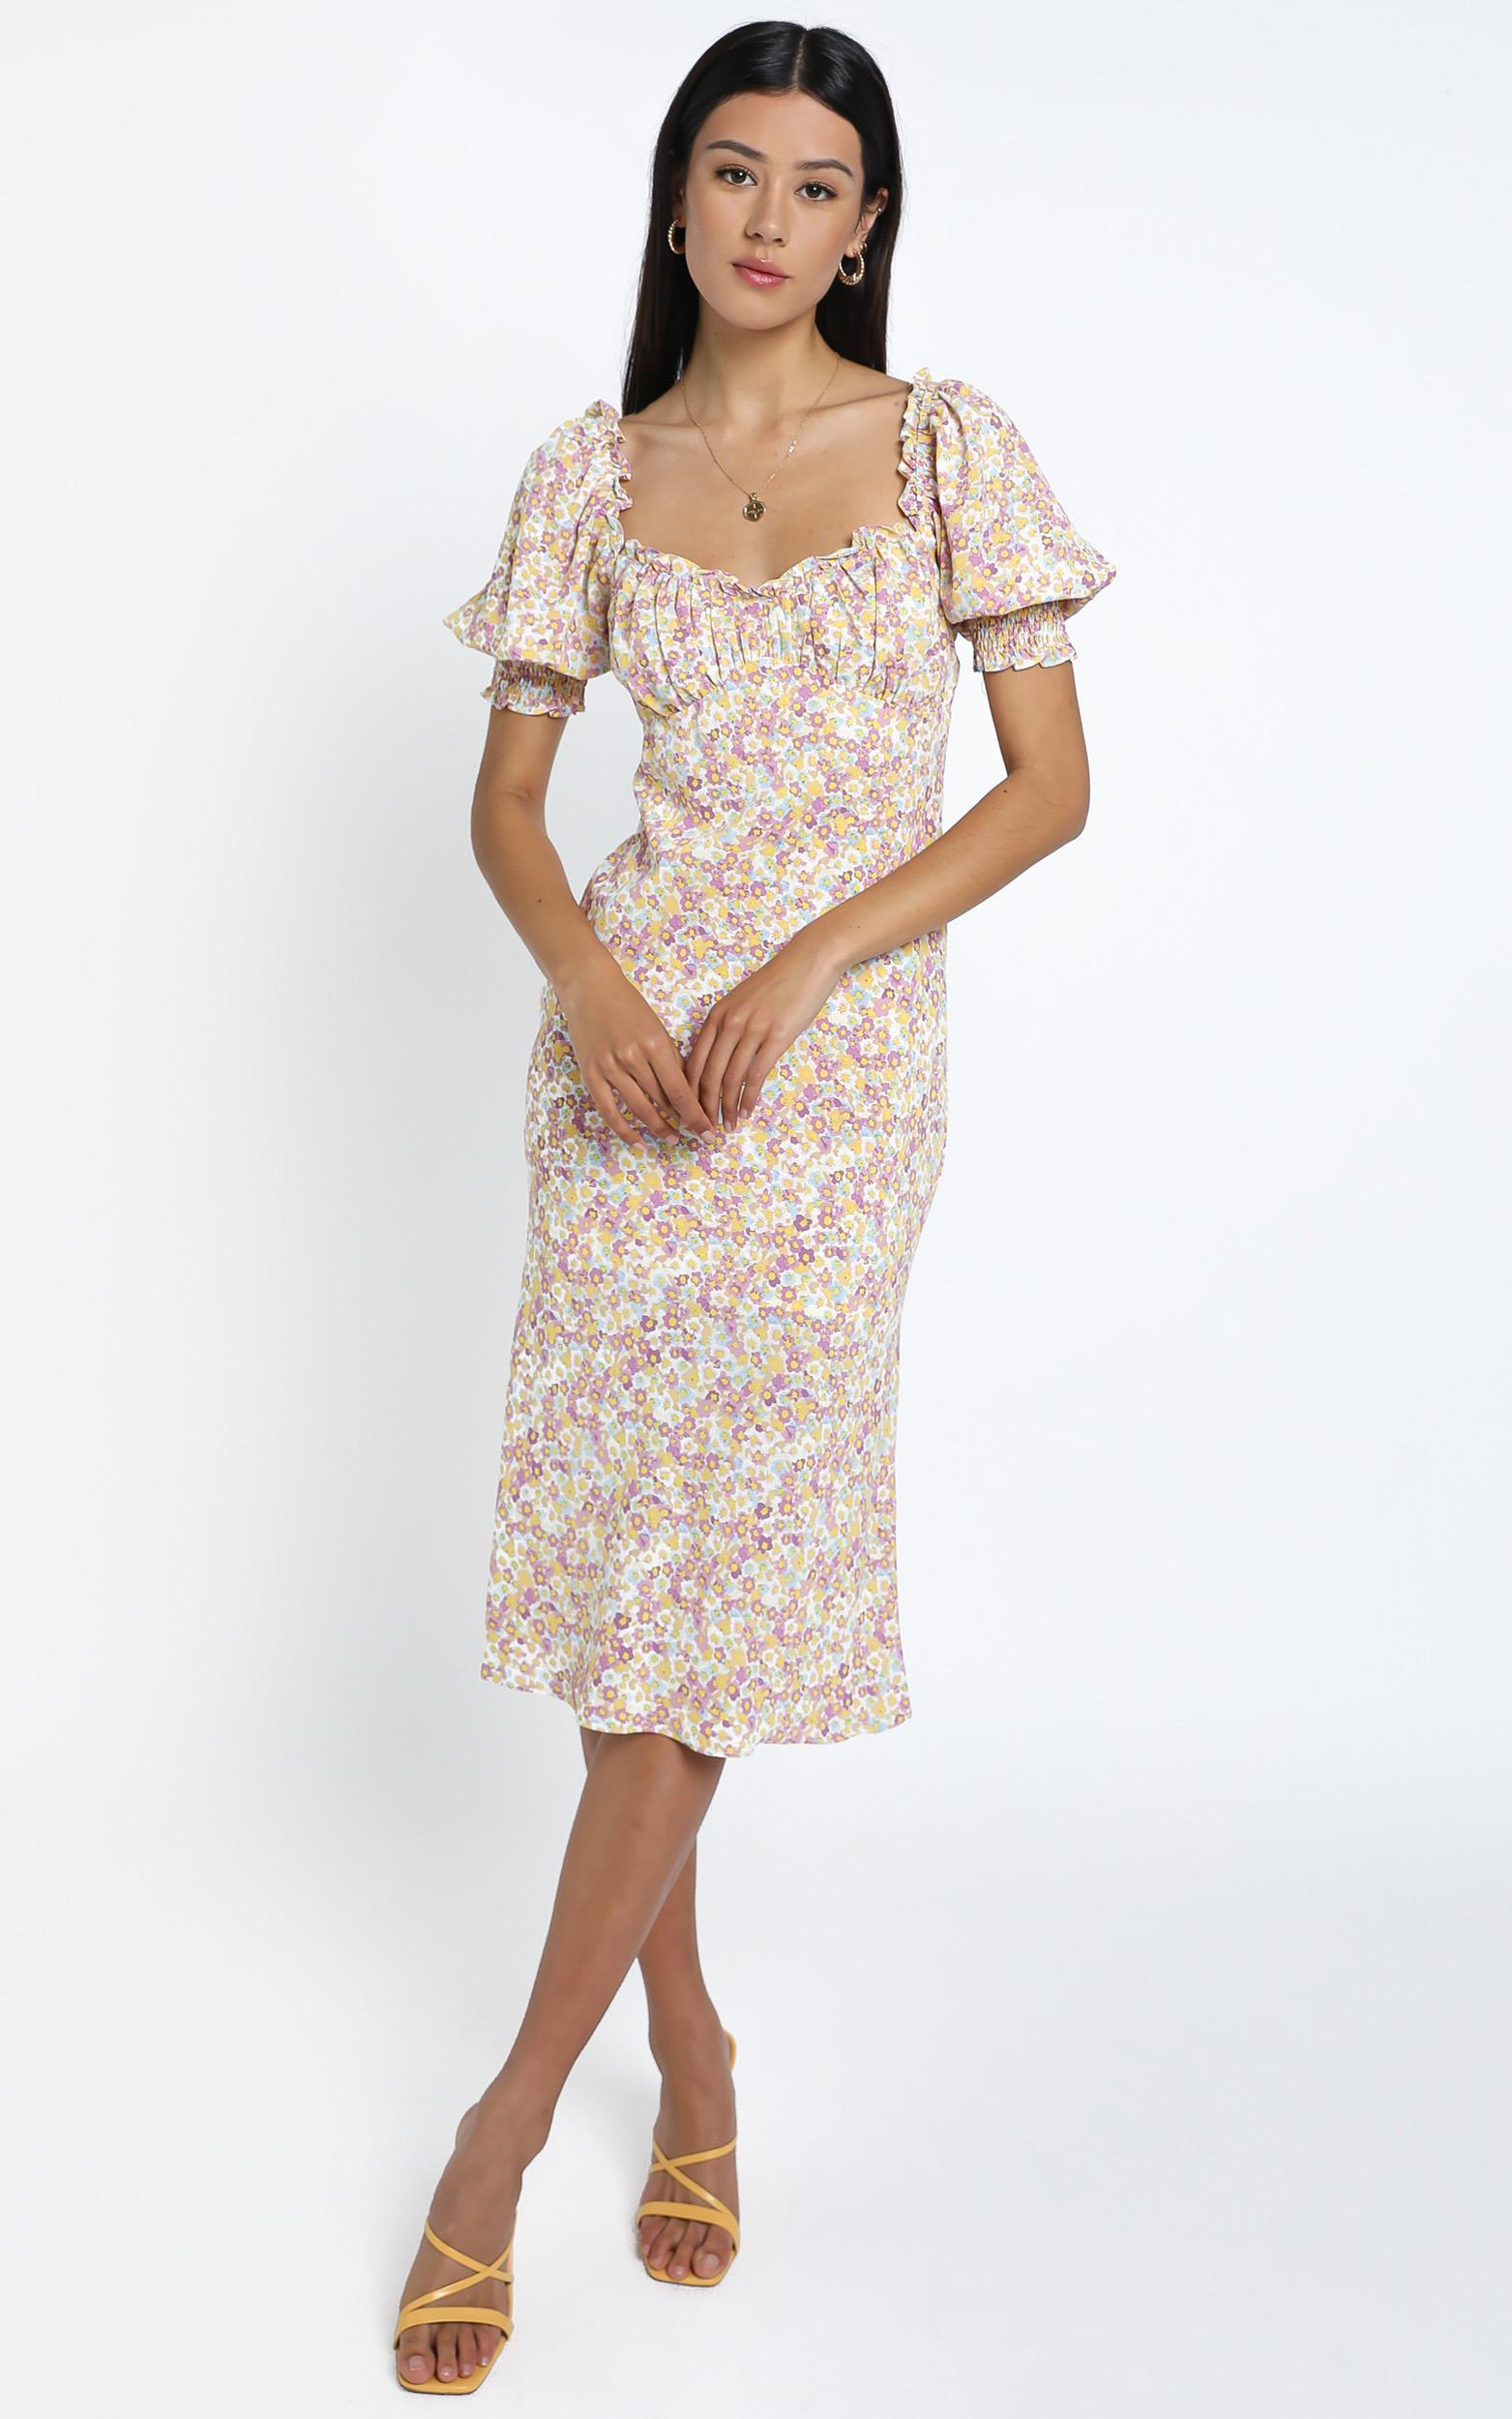 Koby Dress in Pink Floral - 14 (XL), Pink, hi-res image number null